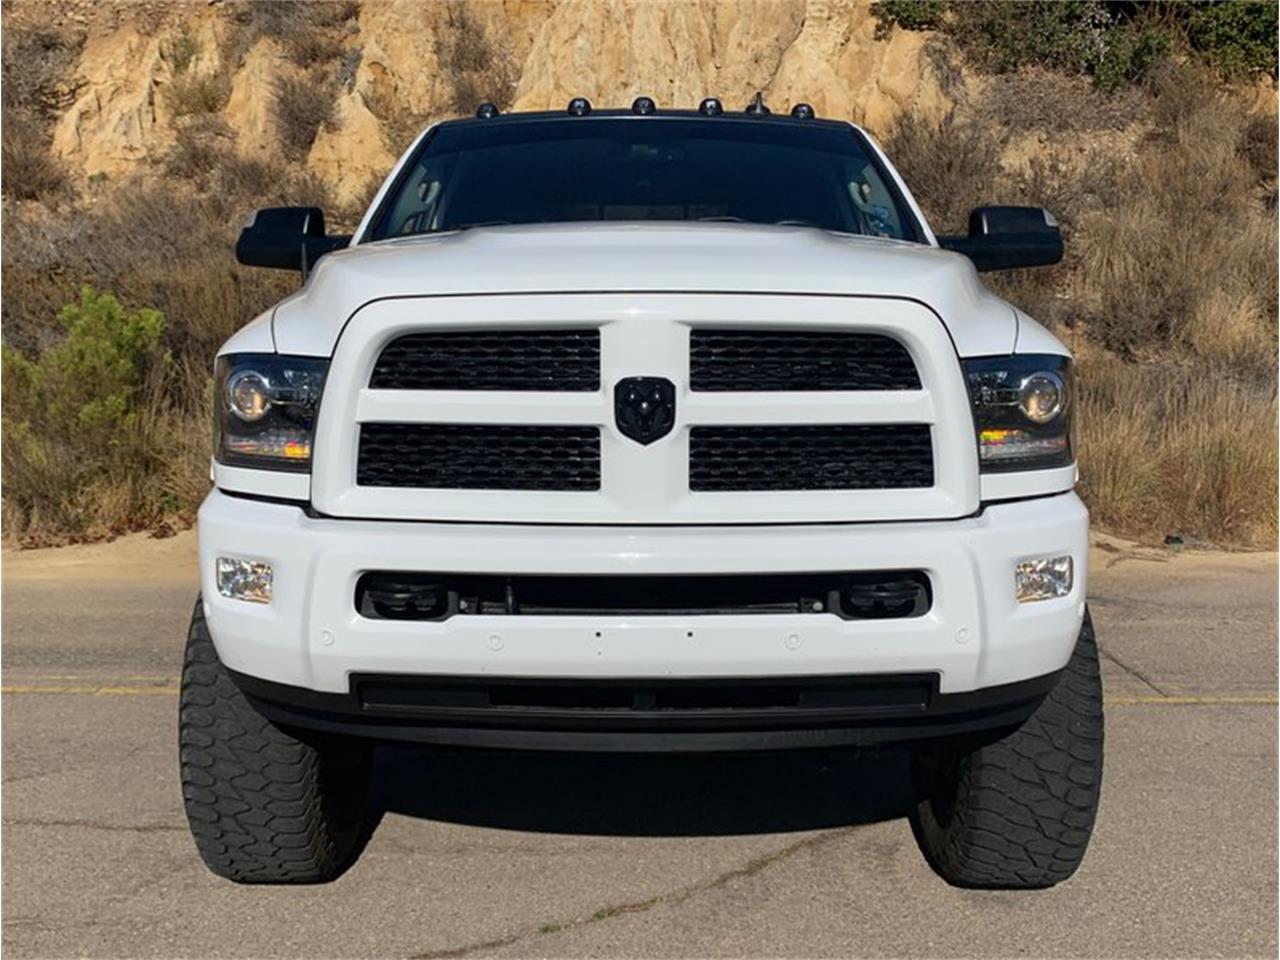 2017 Dodge Ram 2500 (CC-1298285) for sale in San Diego, California